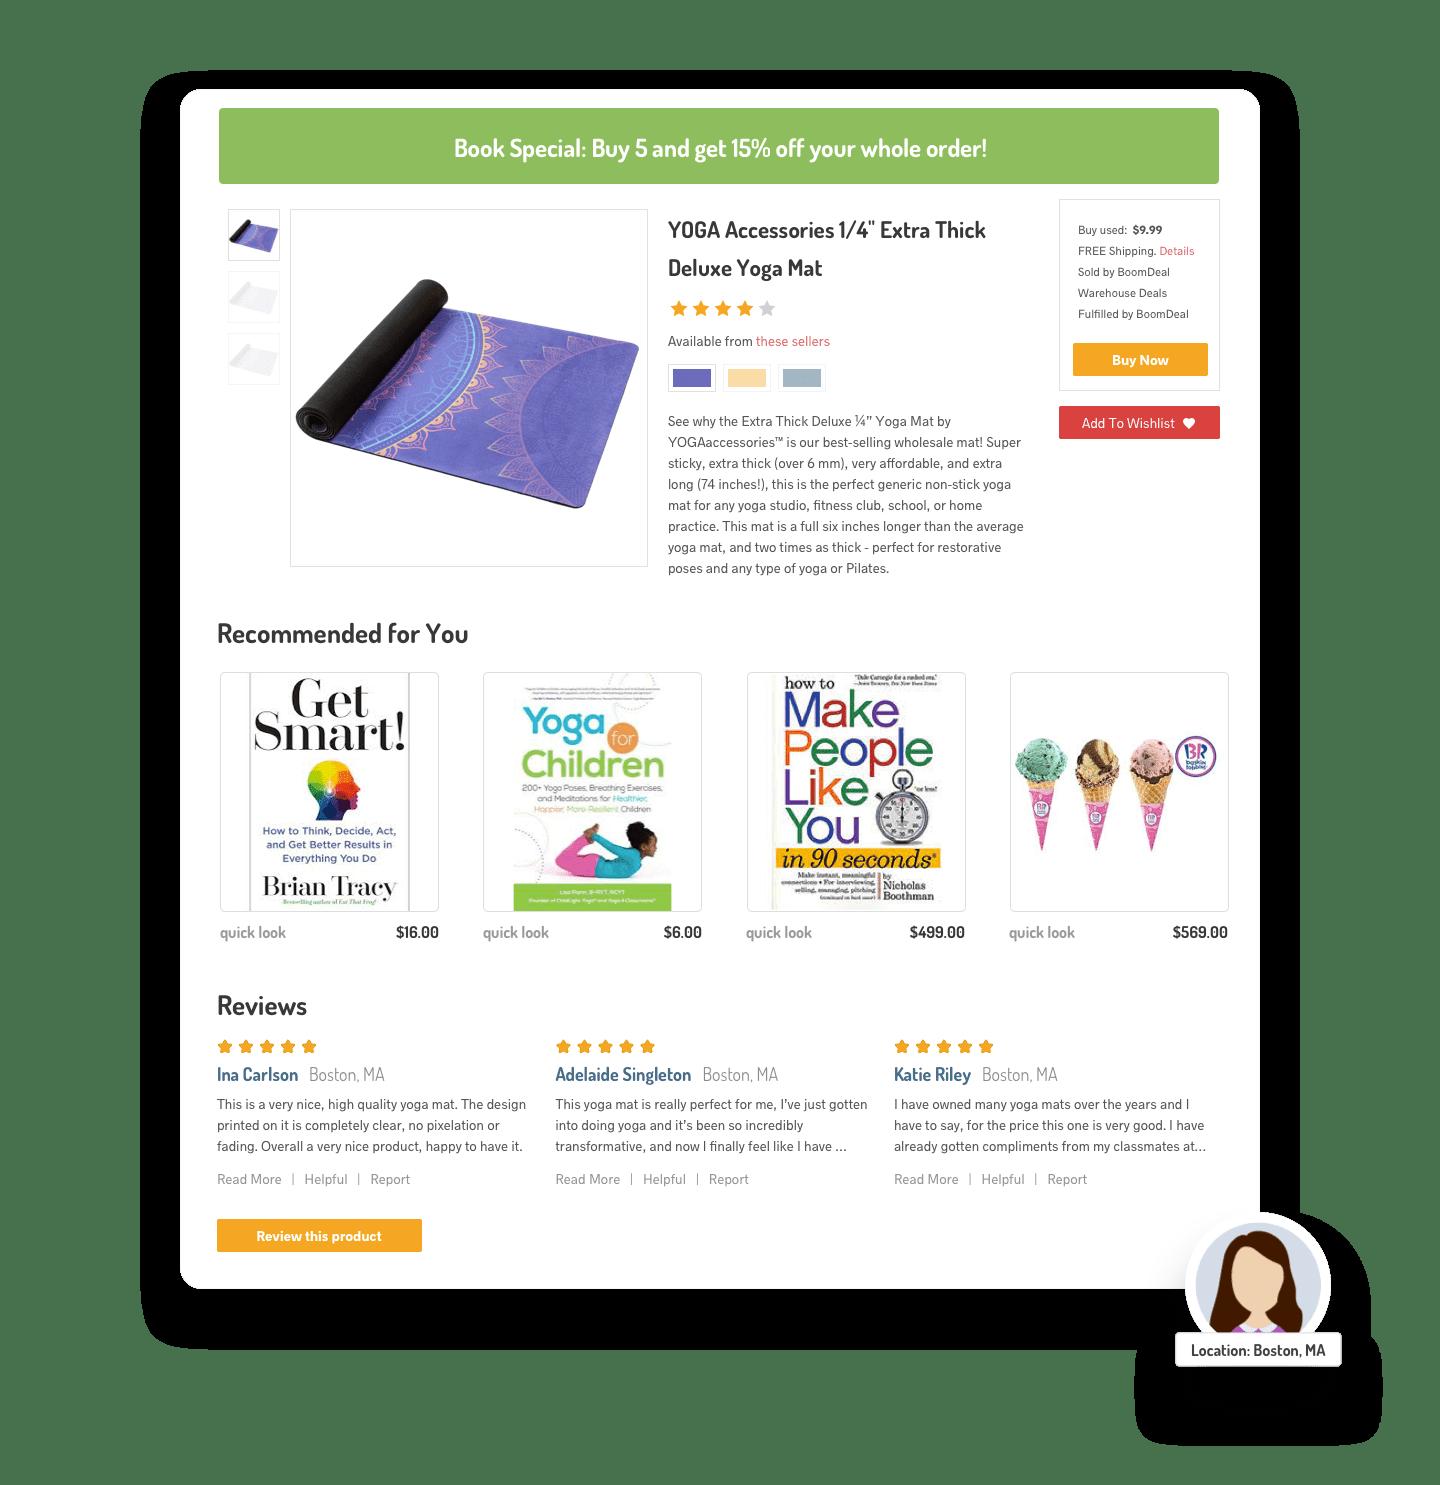 boomdeals-product_reviews_Maria